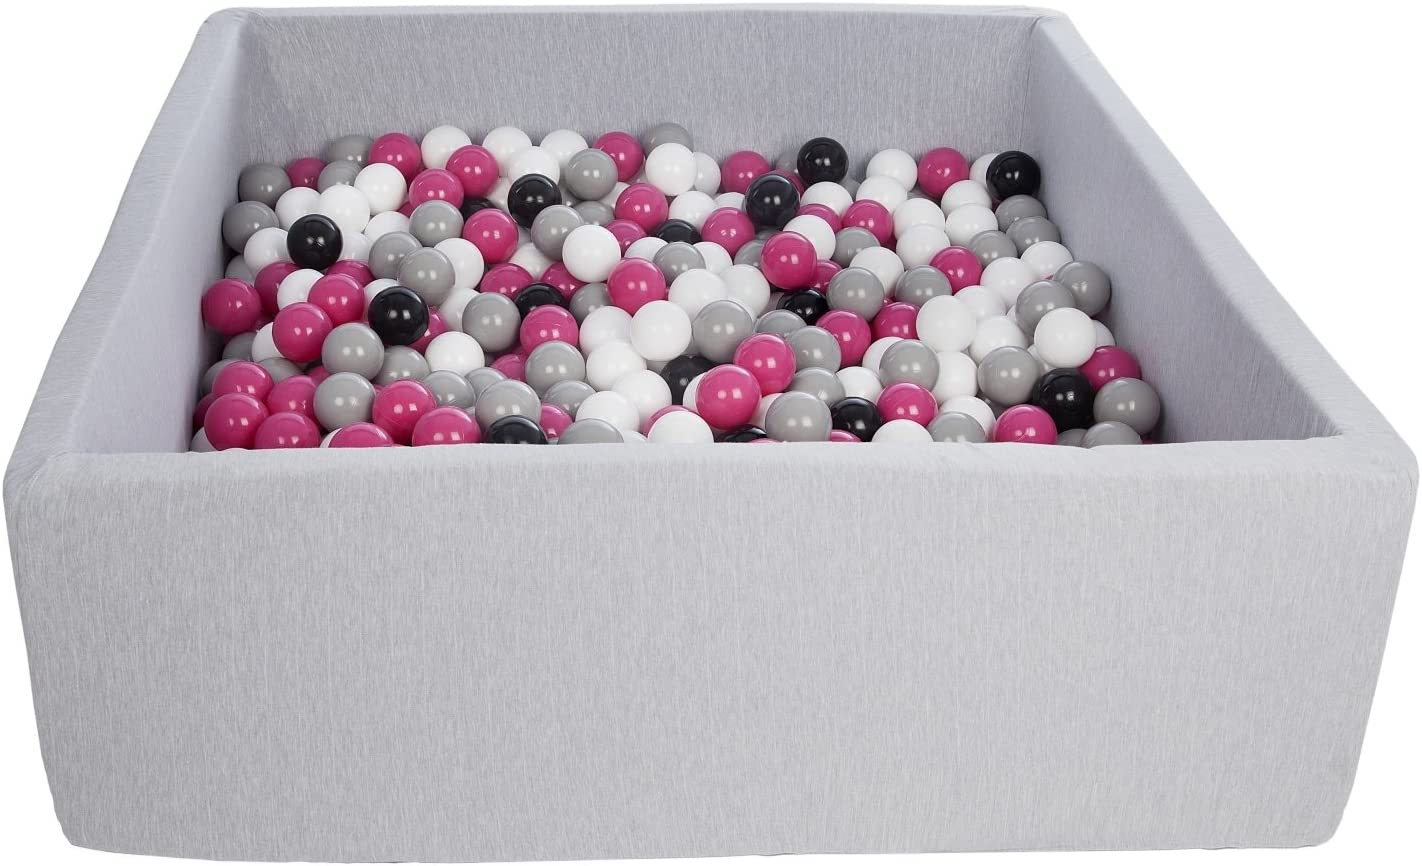 Kugelbad weiches Bällebad Quadrat und Plastikbälle für Kinder Ball Pool Bällch